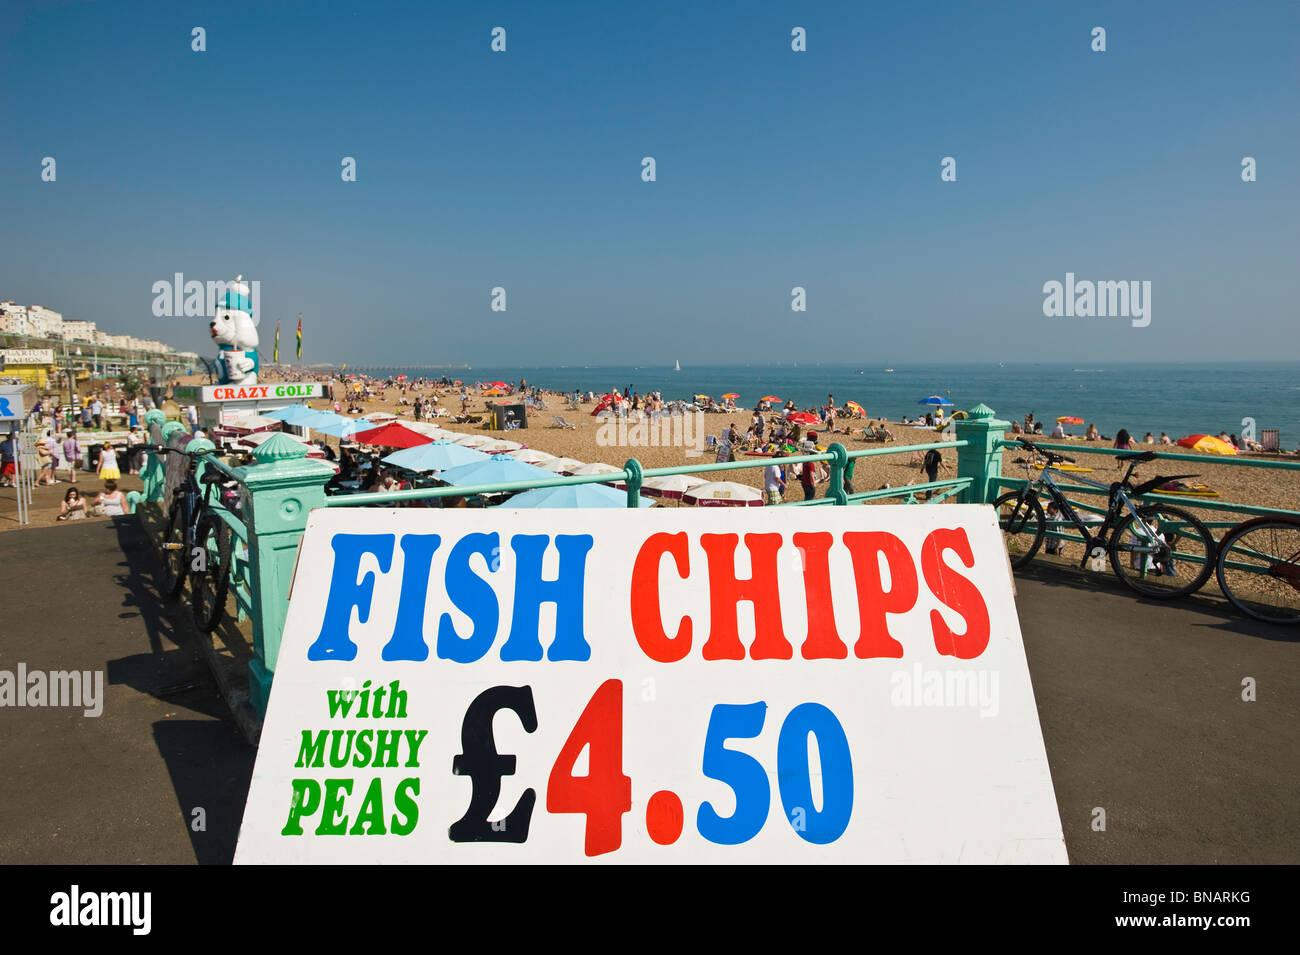 Fish & Chips stall direkt am Meer, Brighton, East Sussex, Großbritannien Stockbild